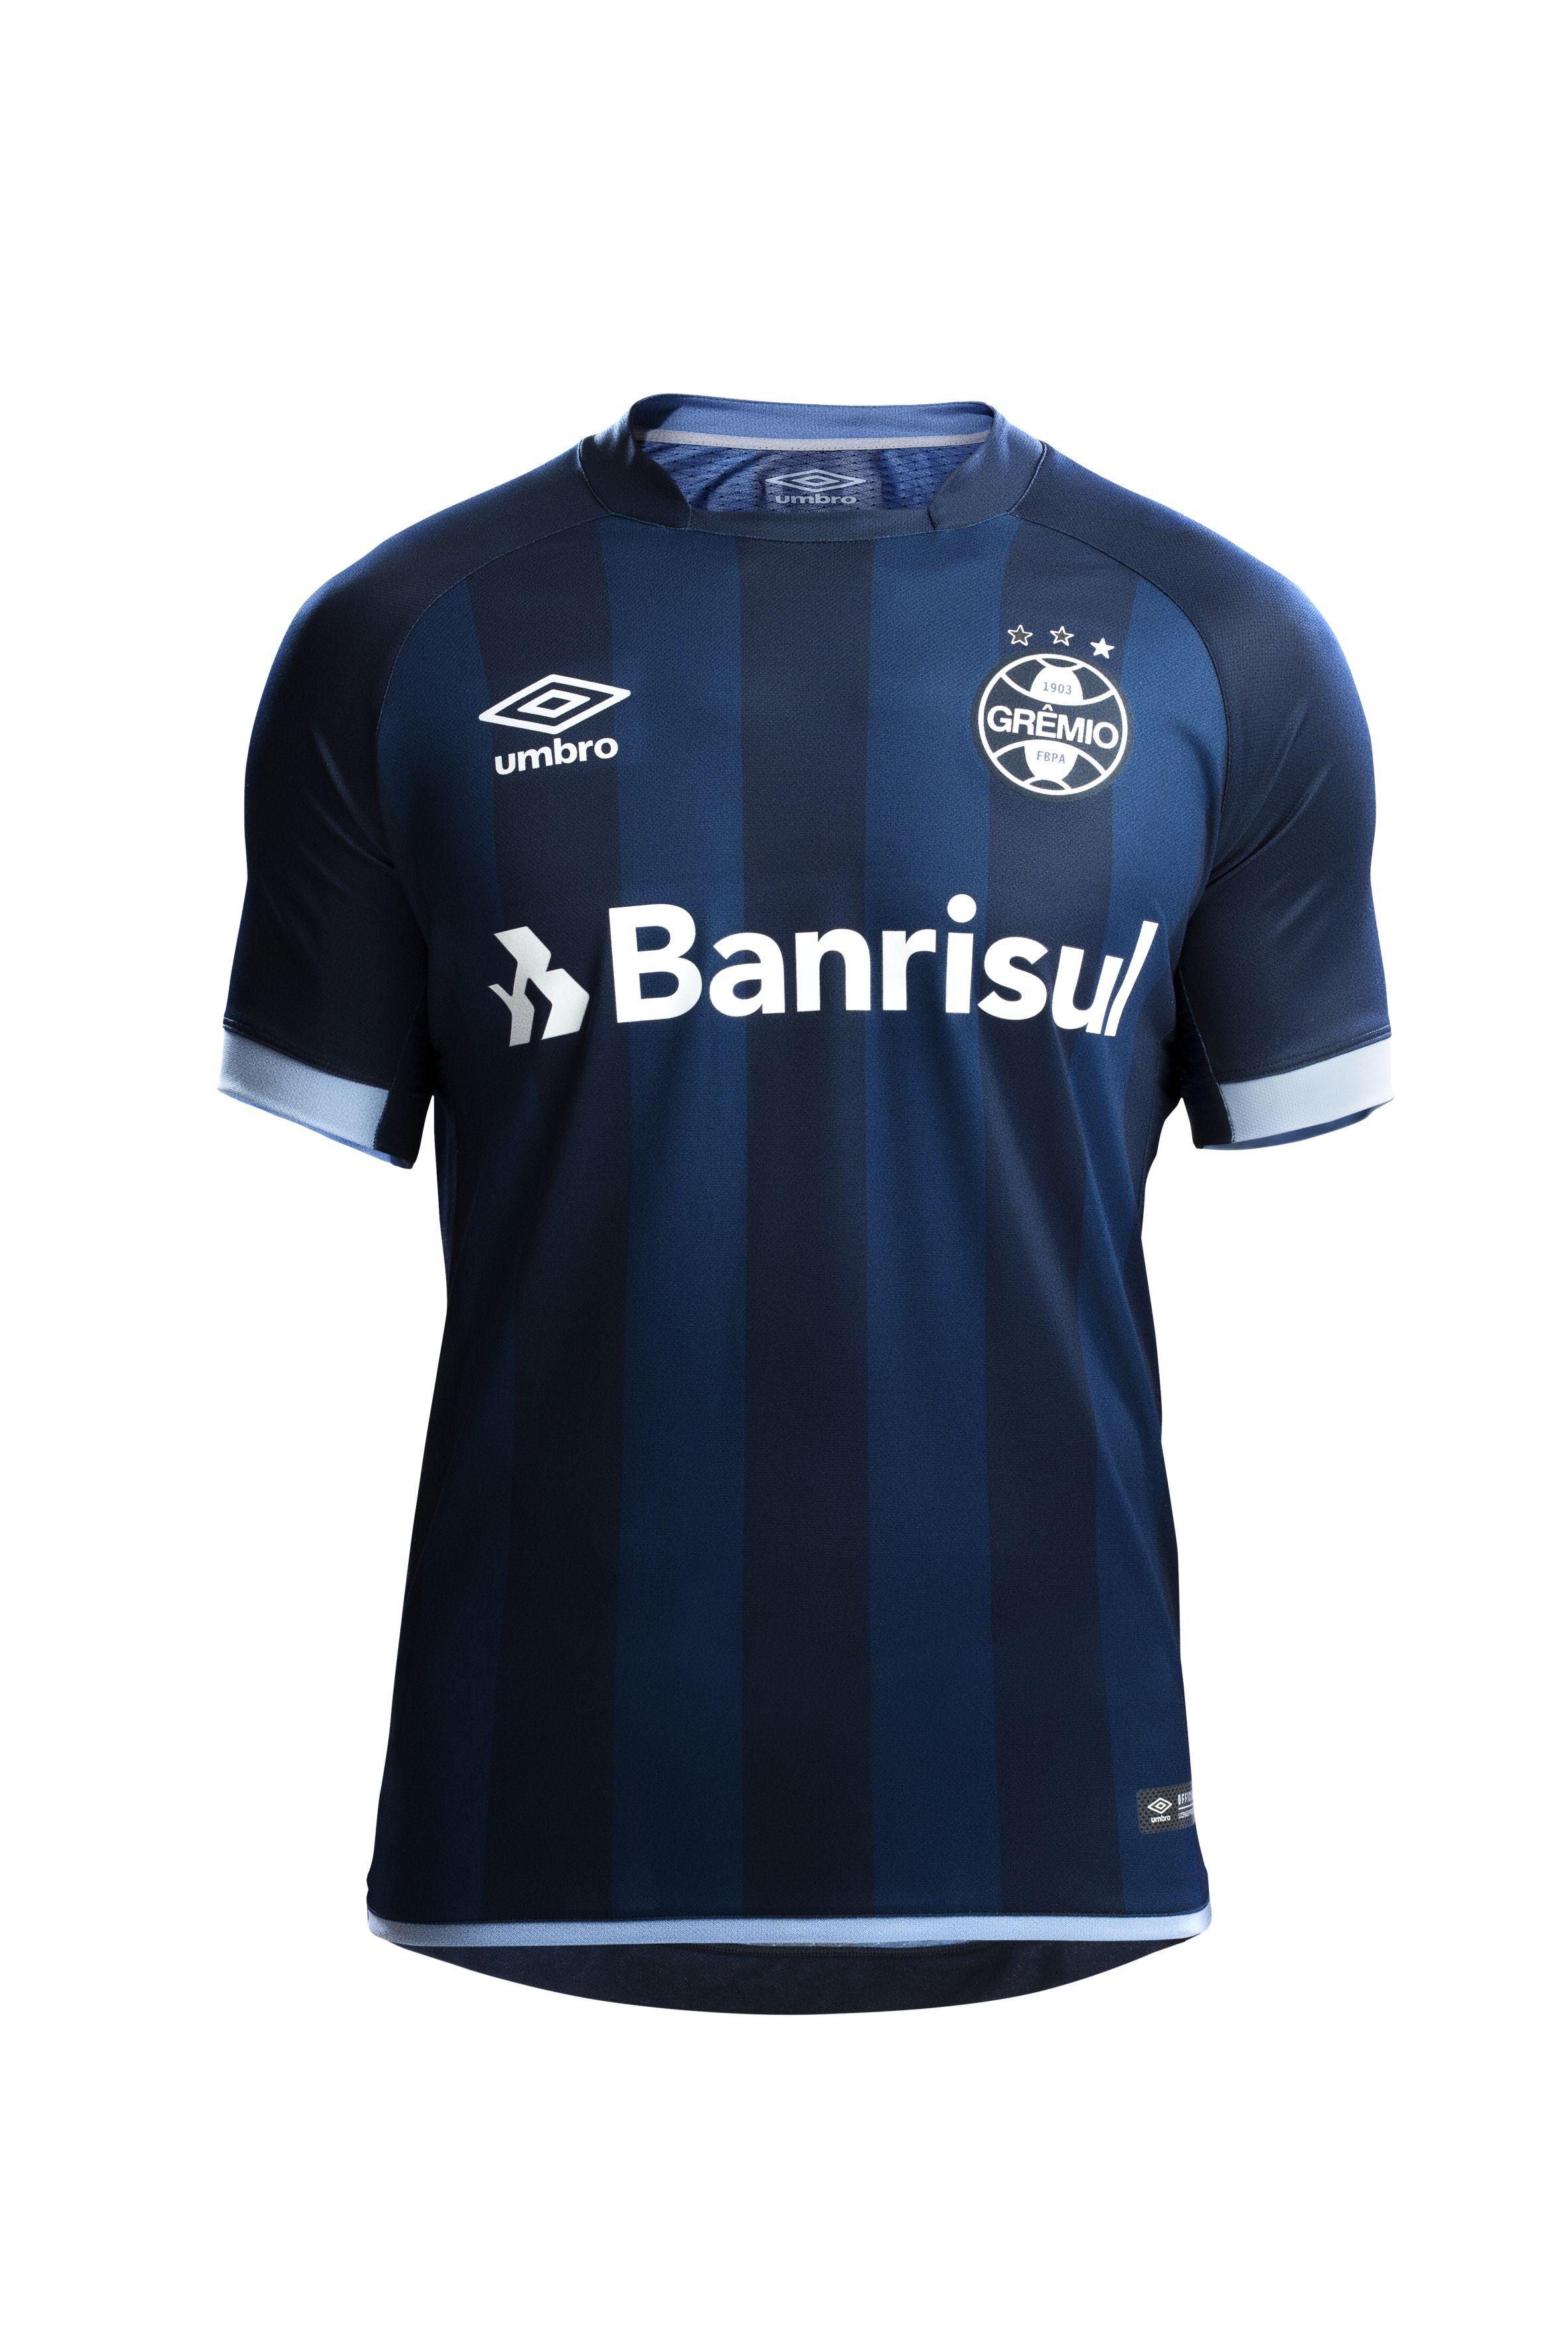 488aed94ba Grêmio apresenta nova camisa 3